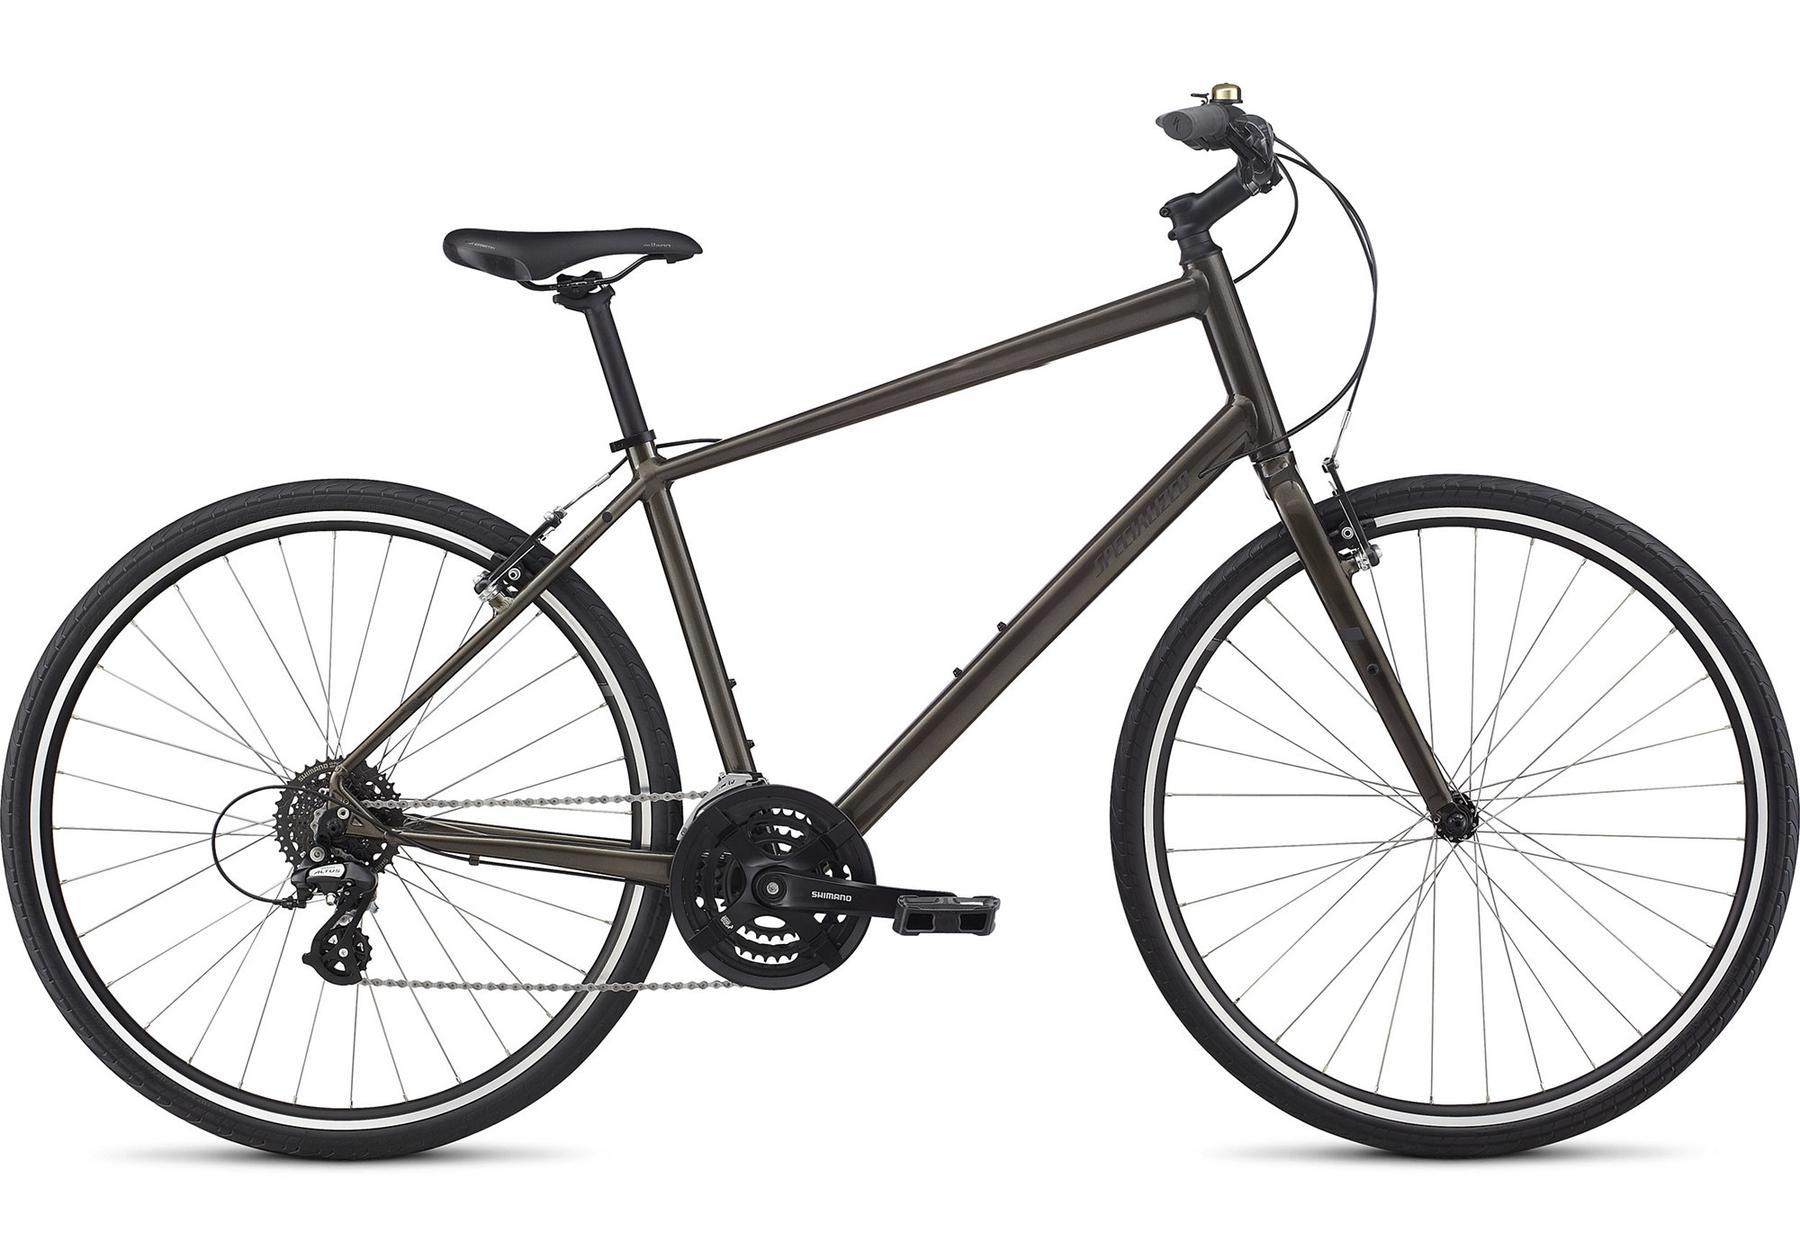 Specialized Alibi Sport City Bikes / Fitnessräder 2017